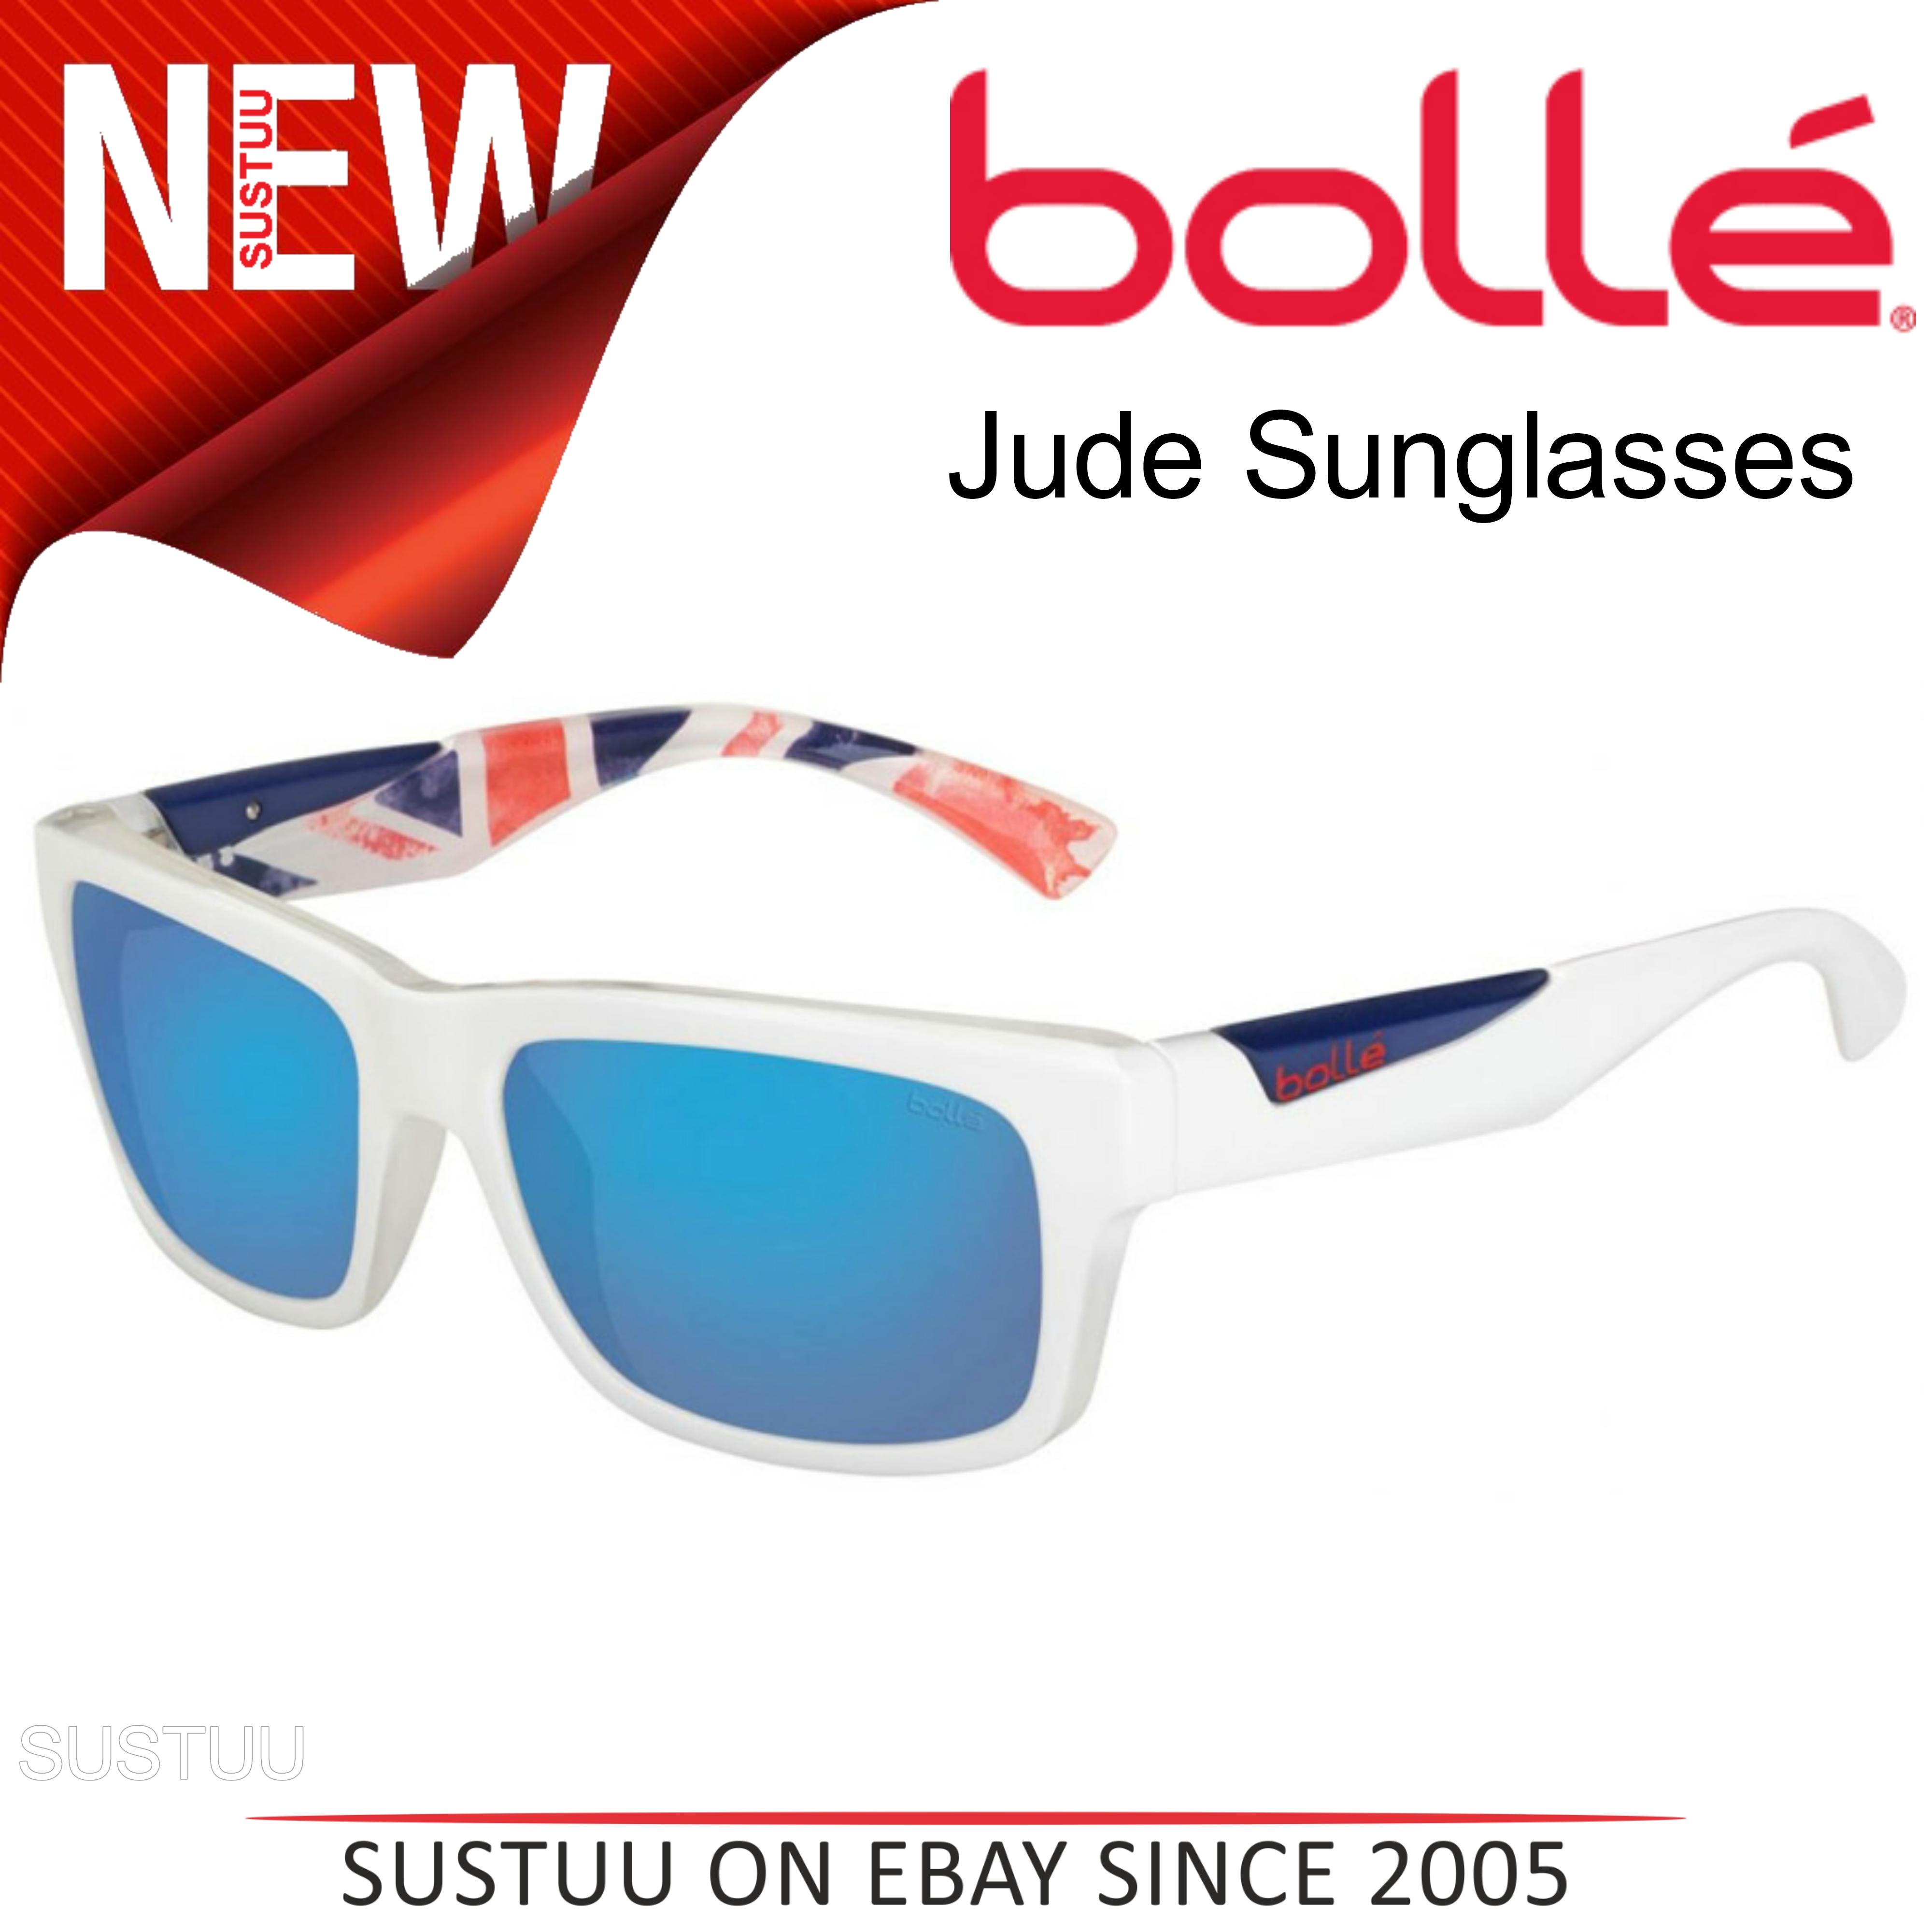 6eea850a9b CENTINELA Bollé Jude Sunglasses│Matte White Reino Unido  Olympic│Polarized│Offshore azul Lens│